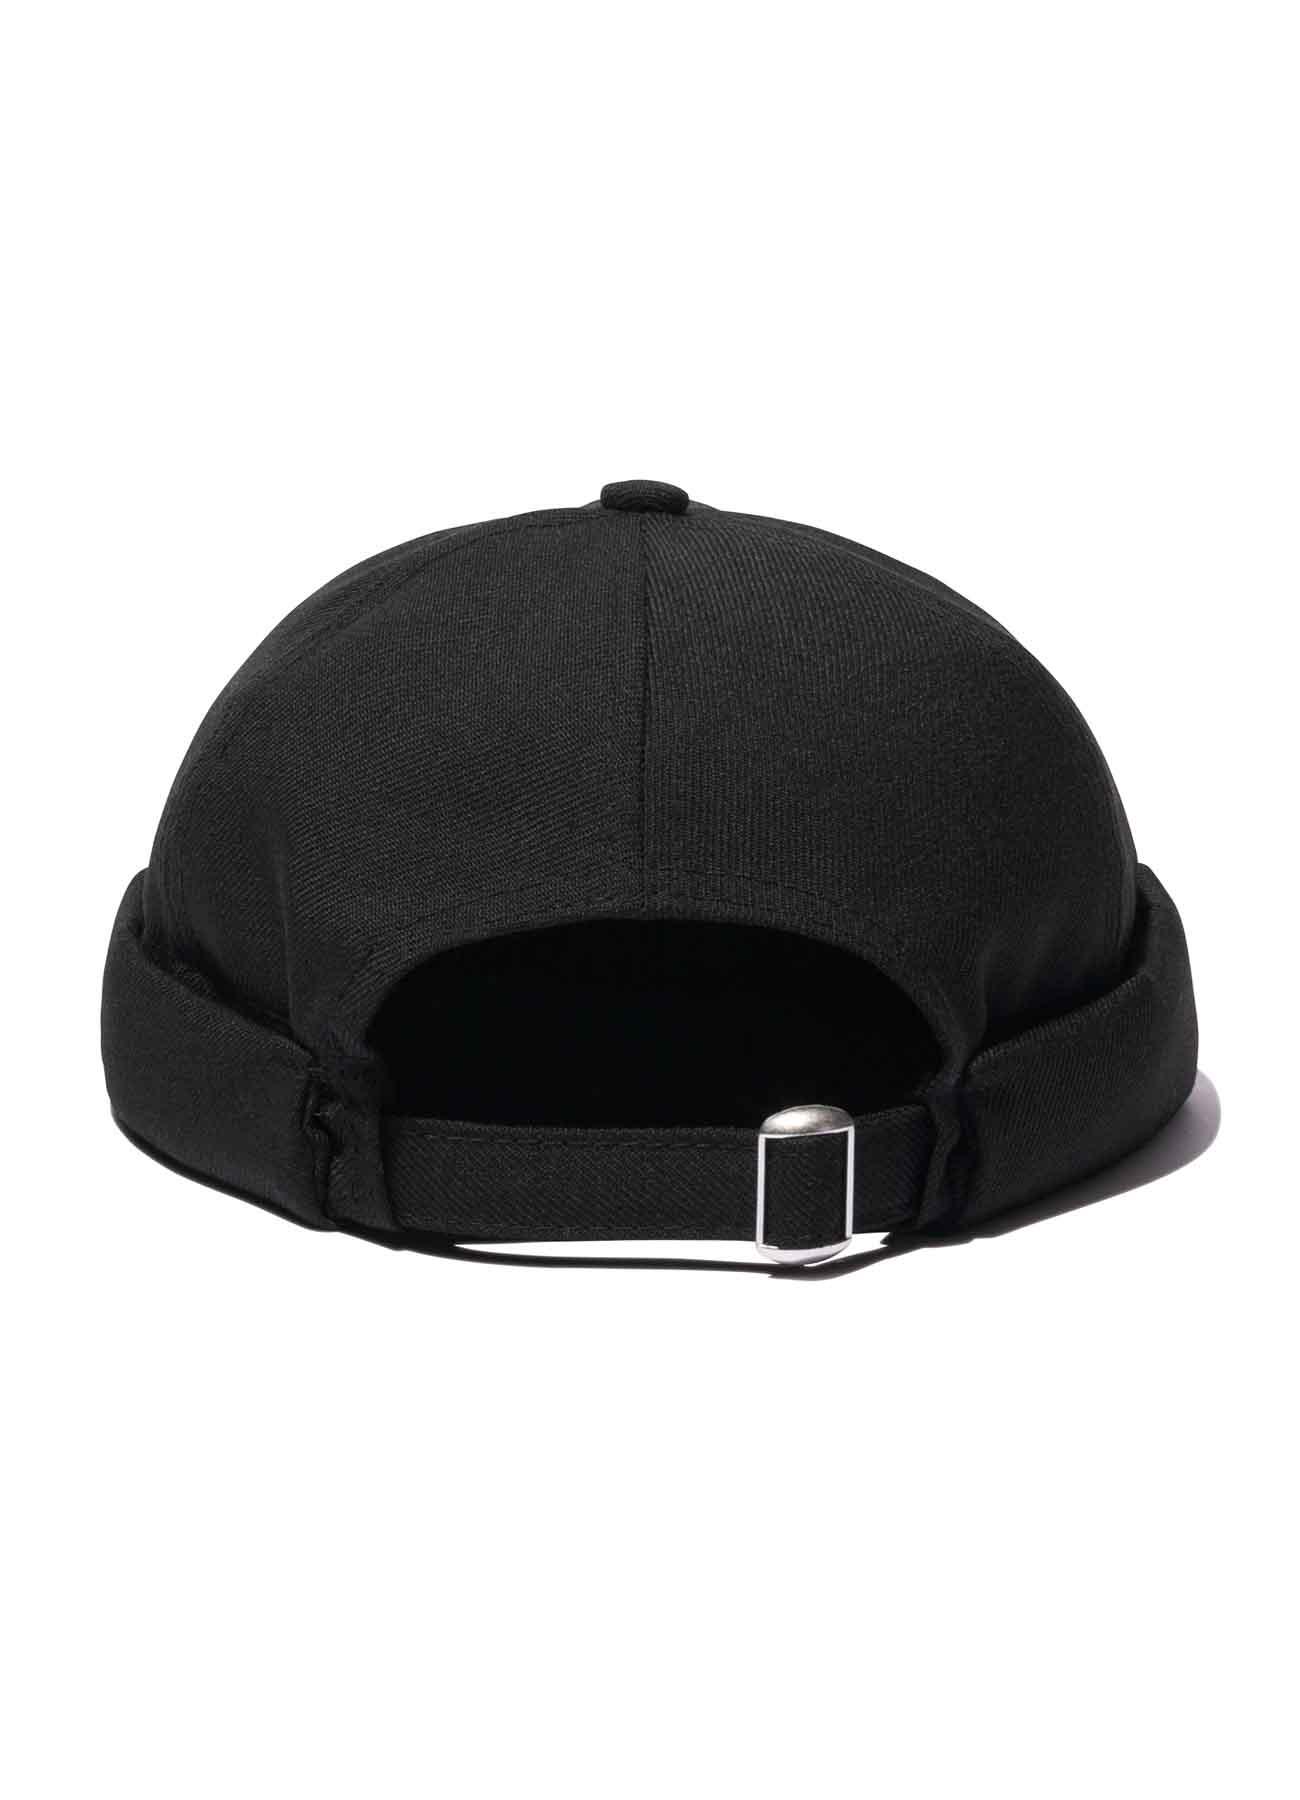 Yohji Yamamoto × New Era WOOL BLACK FISHERMAN CAP